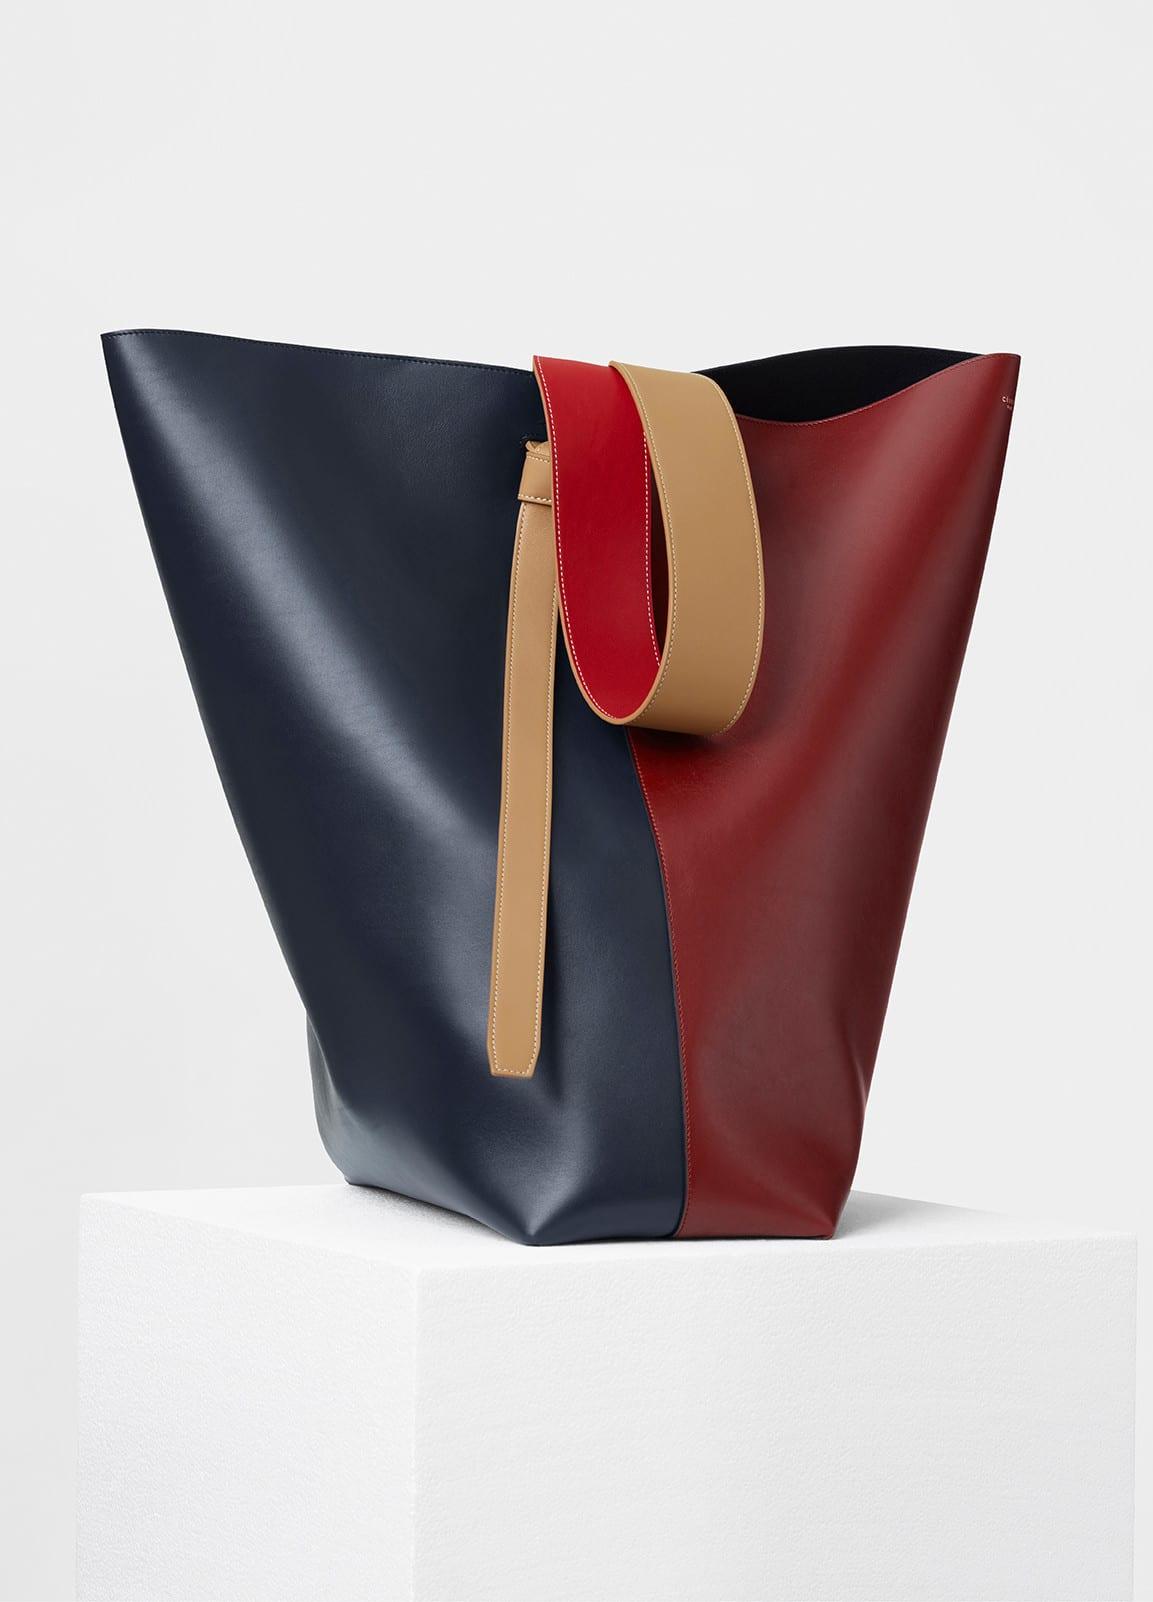 571085d5eef83 Celine Twist Cabas Bag